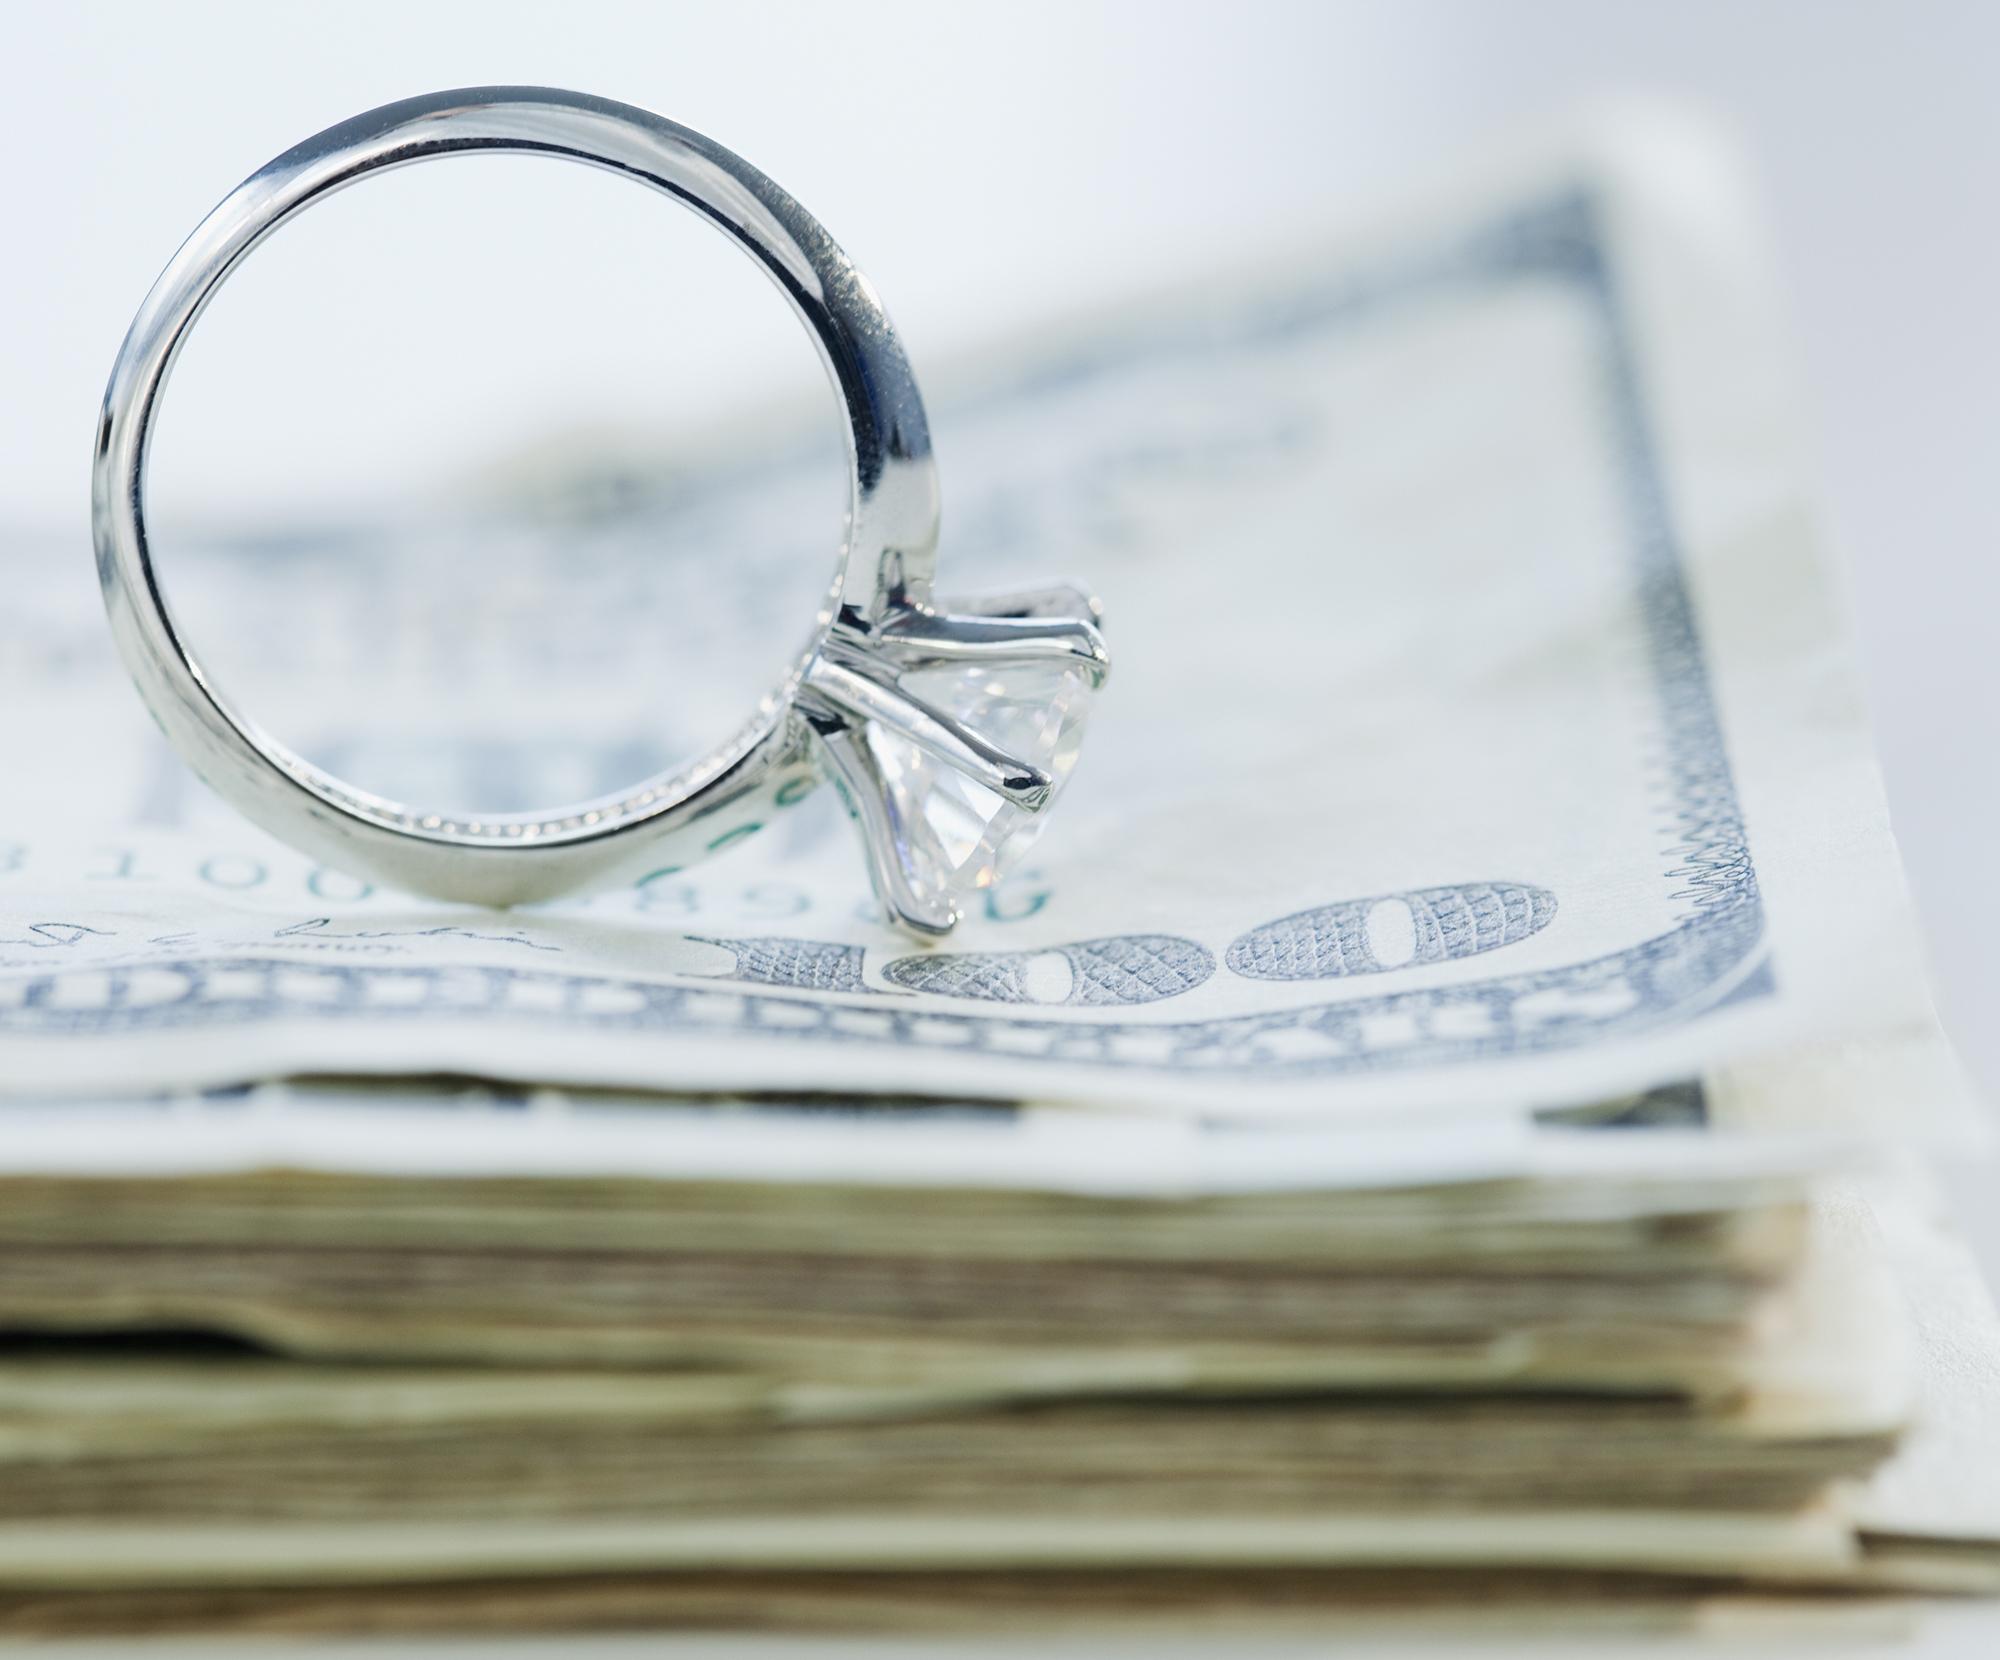 engagement ring sitting on money